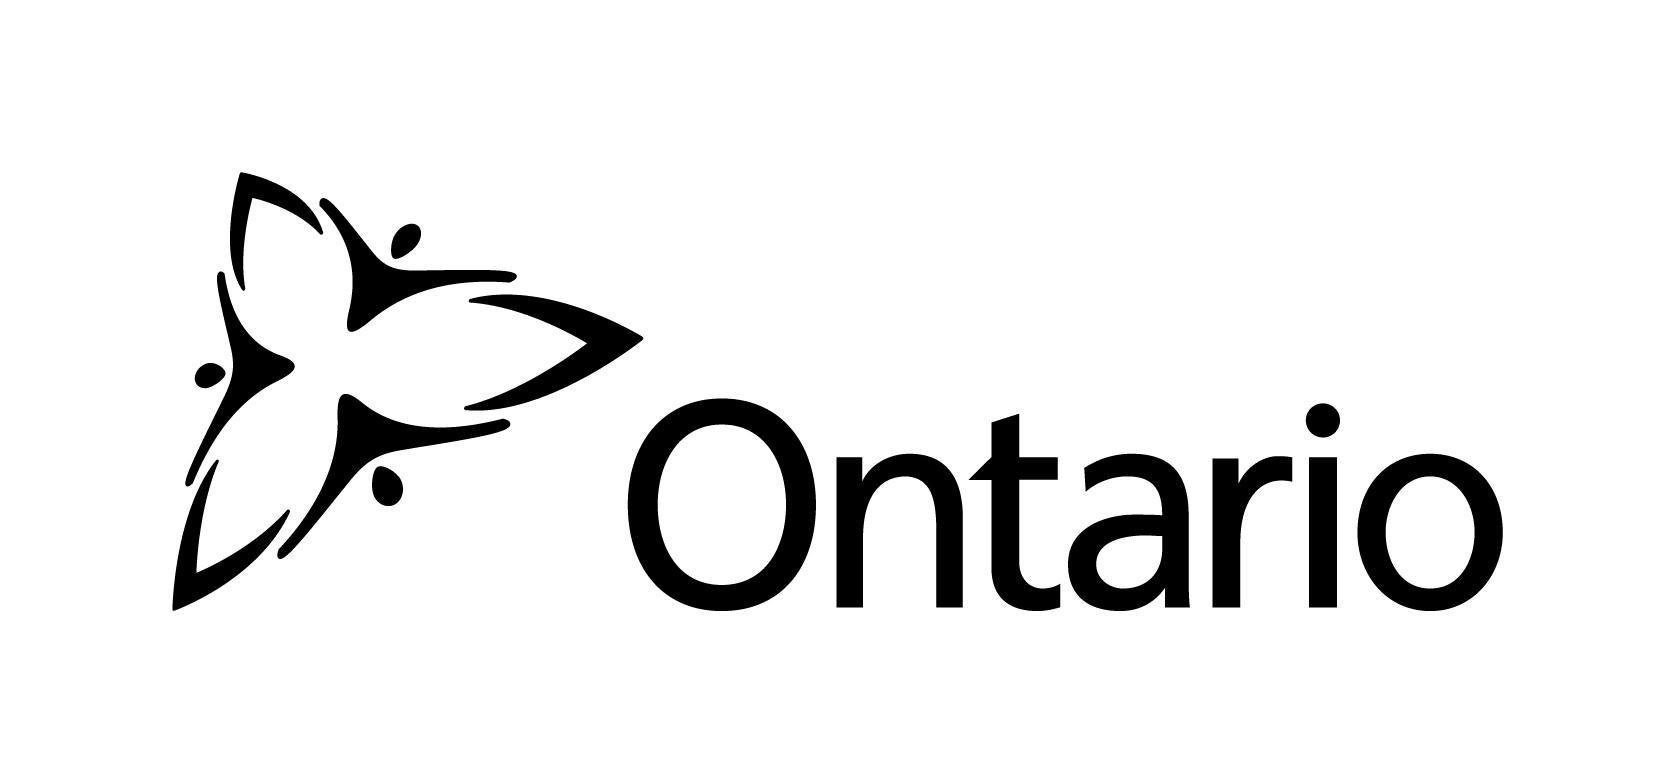 tbs-visualidentity-Ontario-logo-Blk.jpg